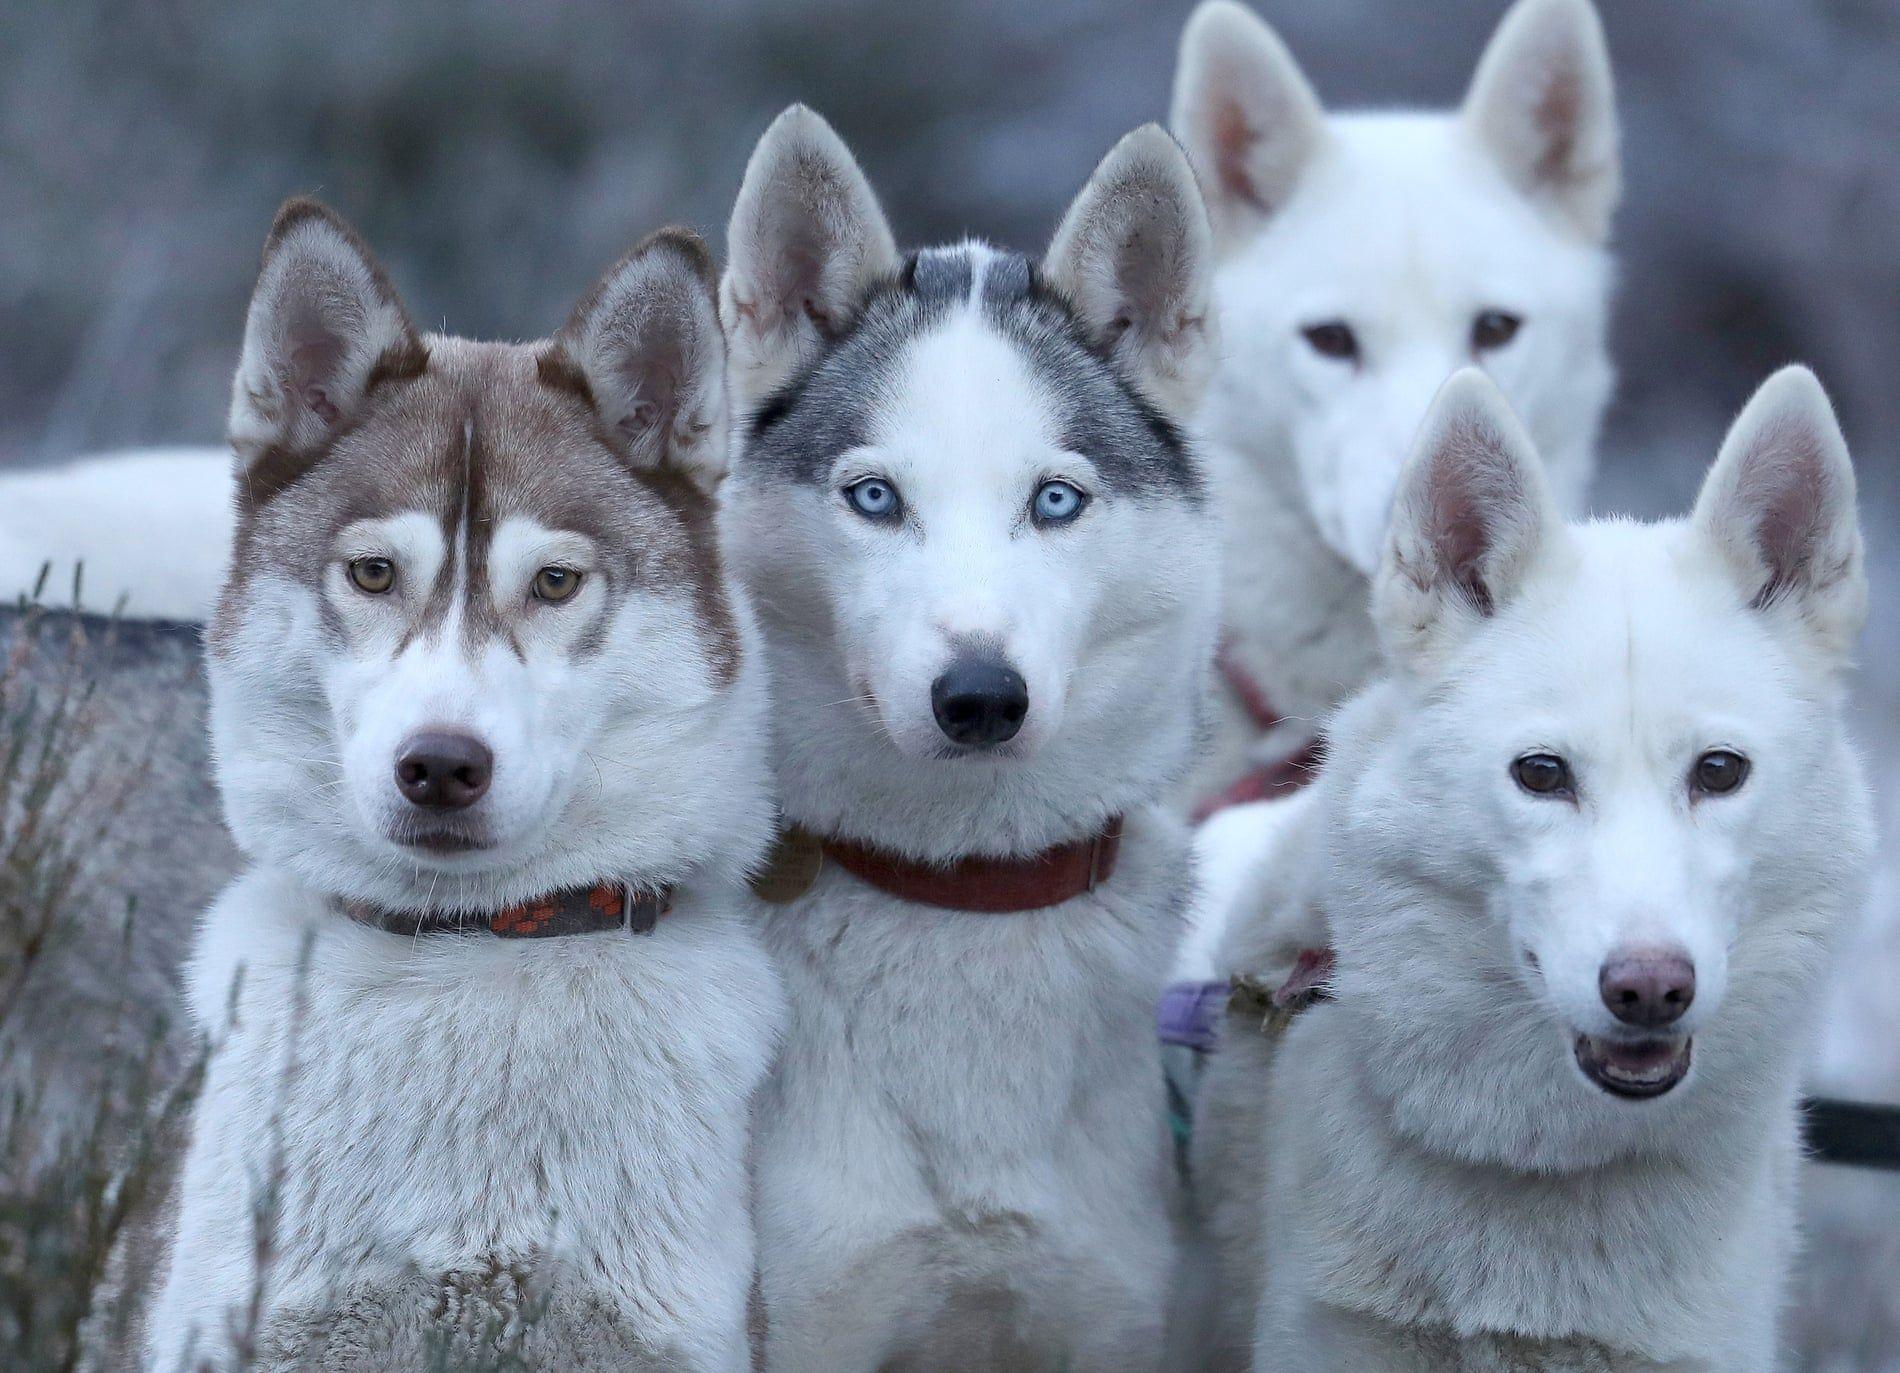 Husky dogs training session at Feshiebridge, Scotland